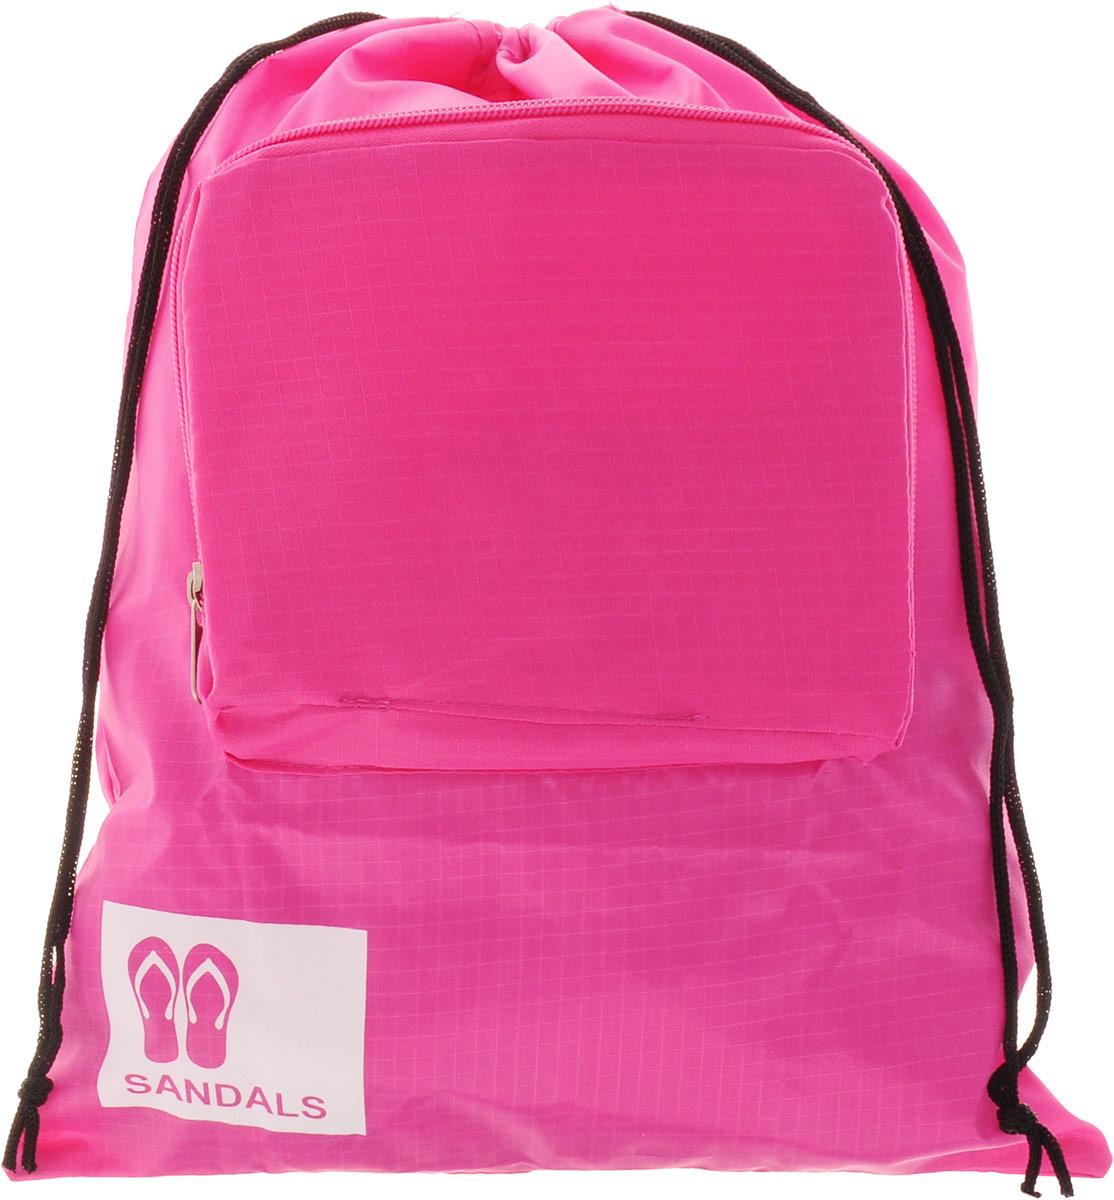 Colibri Чехол для обуви, цвет: розовый, 39 х 31 см